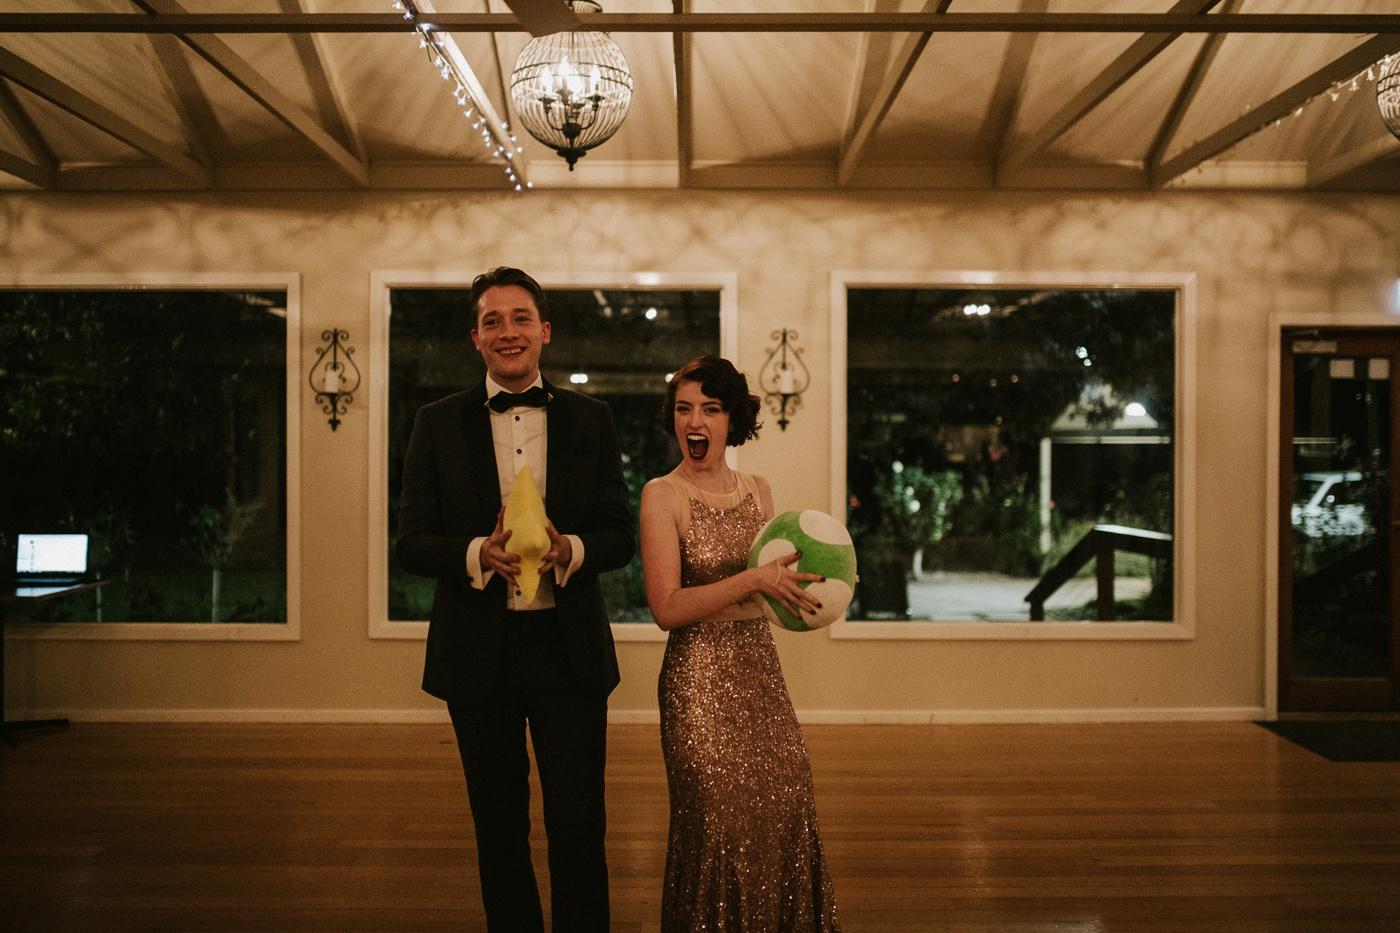 Emma&Morgan_Melbourne-Vintage-Elegant-Fun-Quirky-Yarra-Valley-Vineyard-Wedding_Melbourne-Wedding-Photography-107